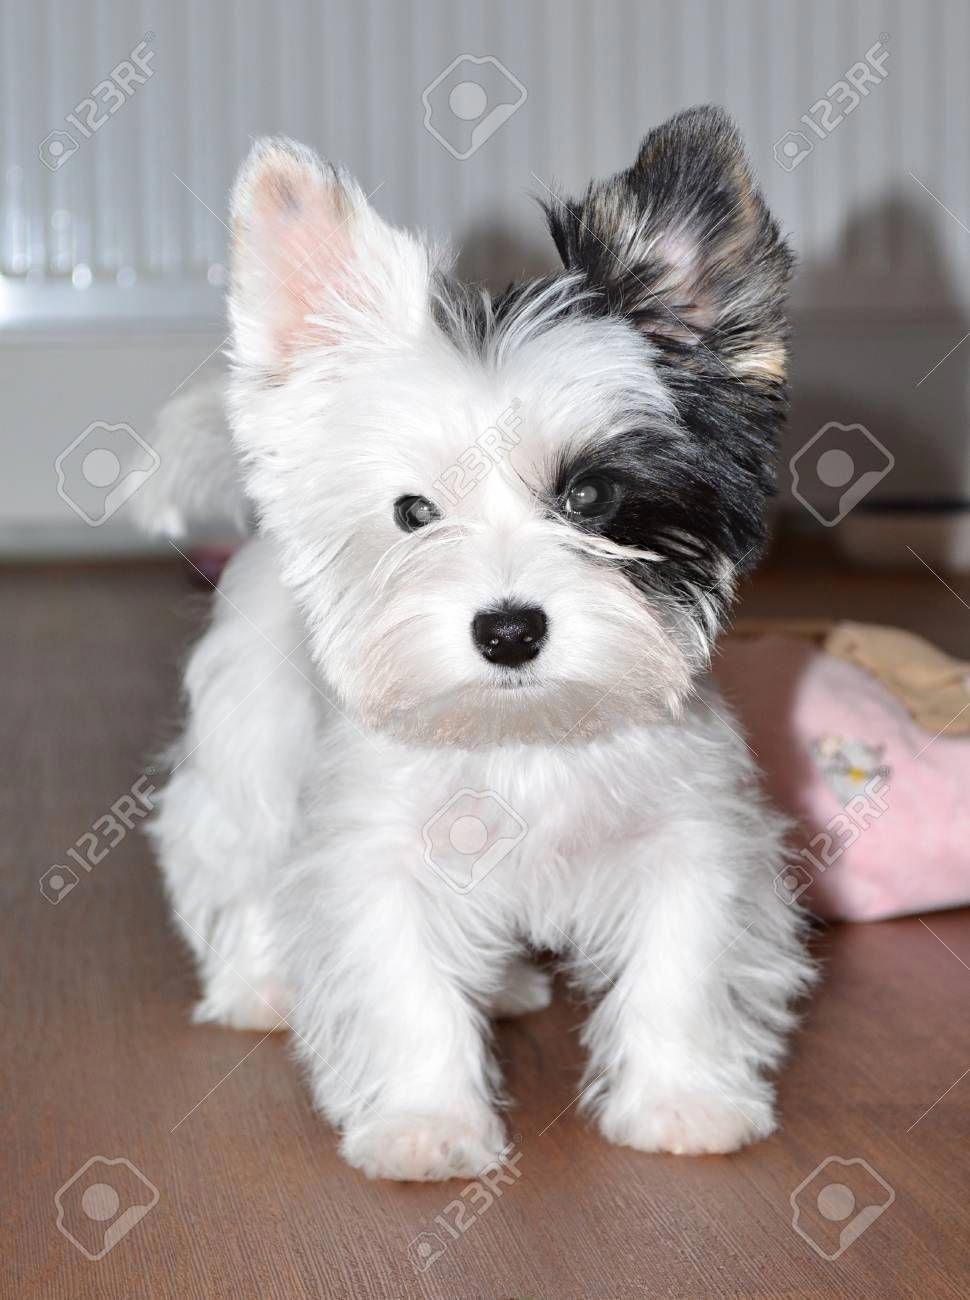 Wild West Yorkies Yorkie Yorkie Puppy Yorkshire Terrier